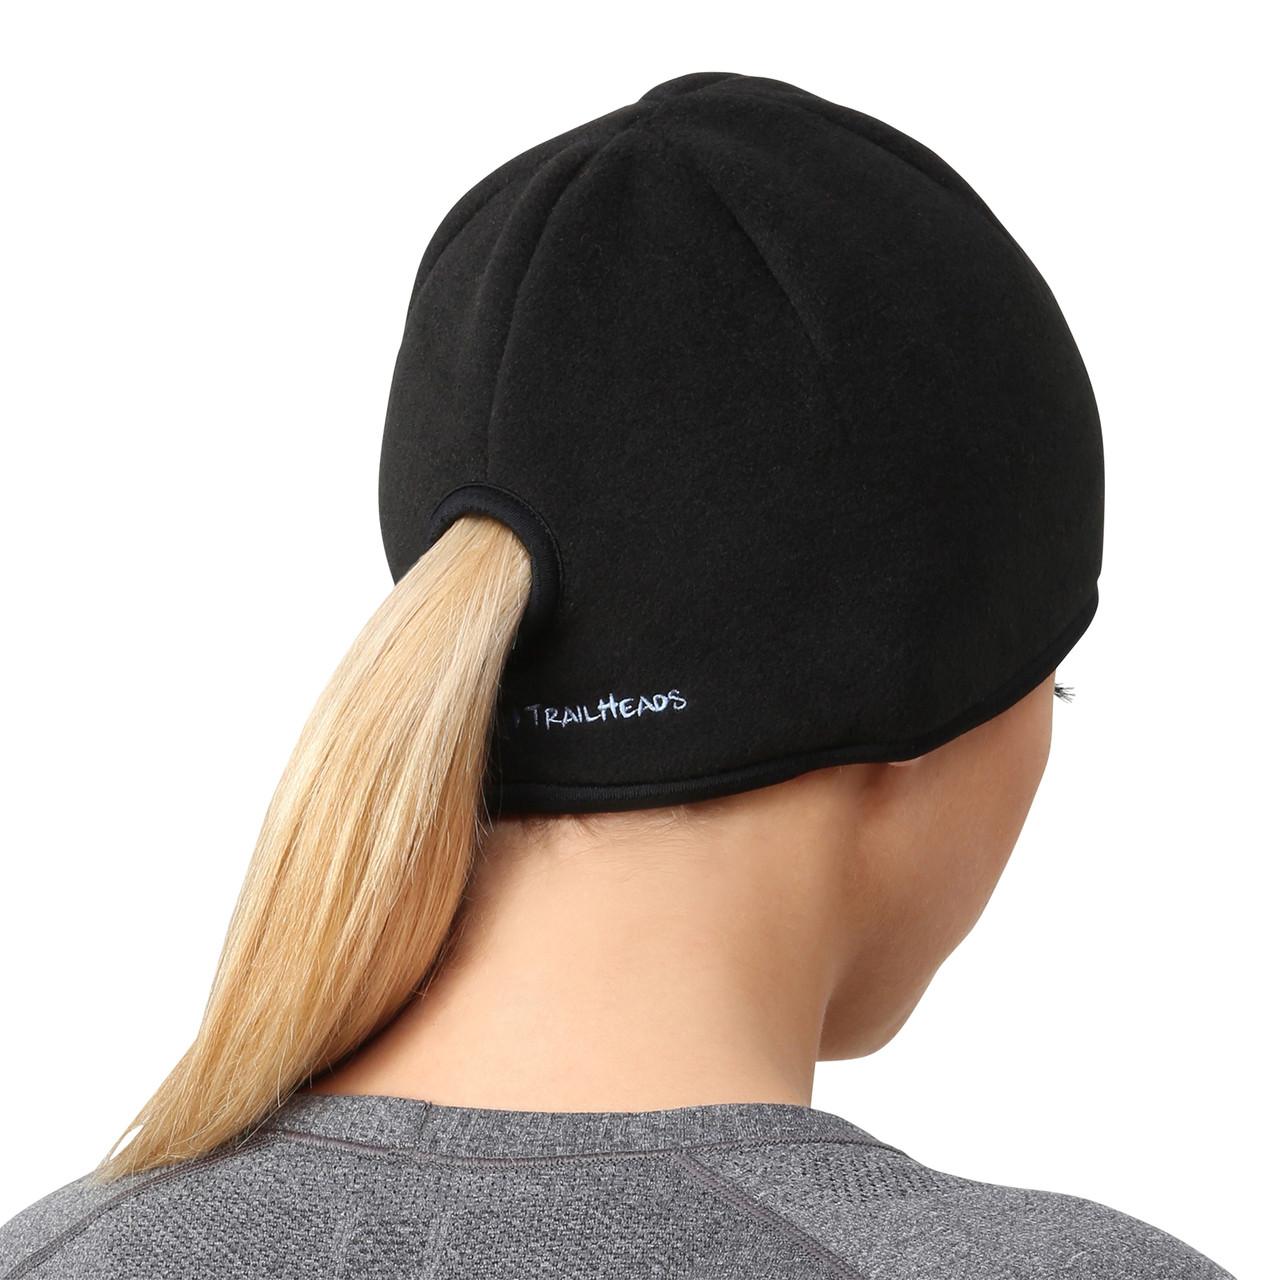 Trailheads Womens Running Ponytail Hat Black Black